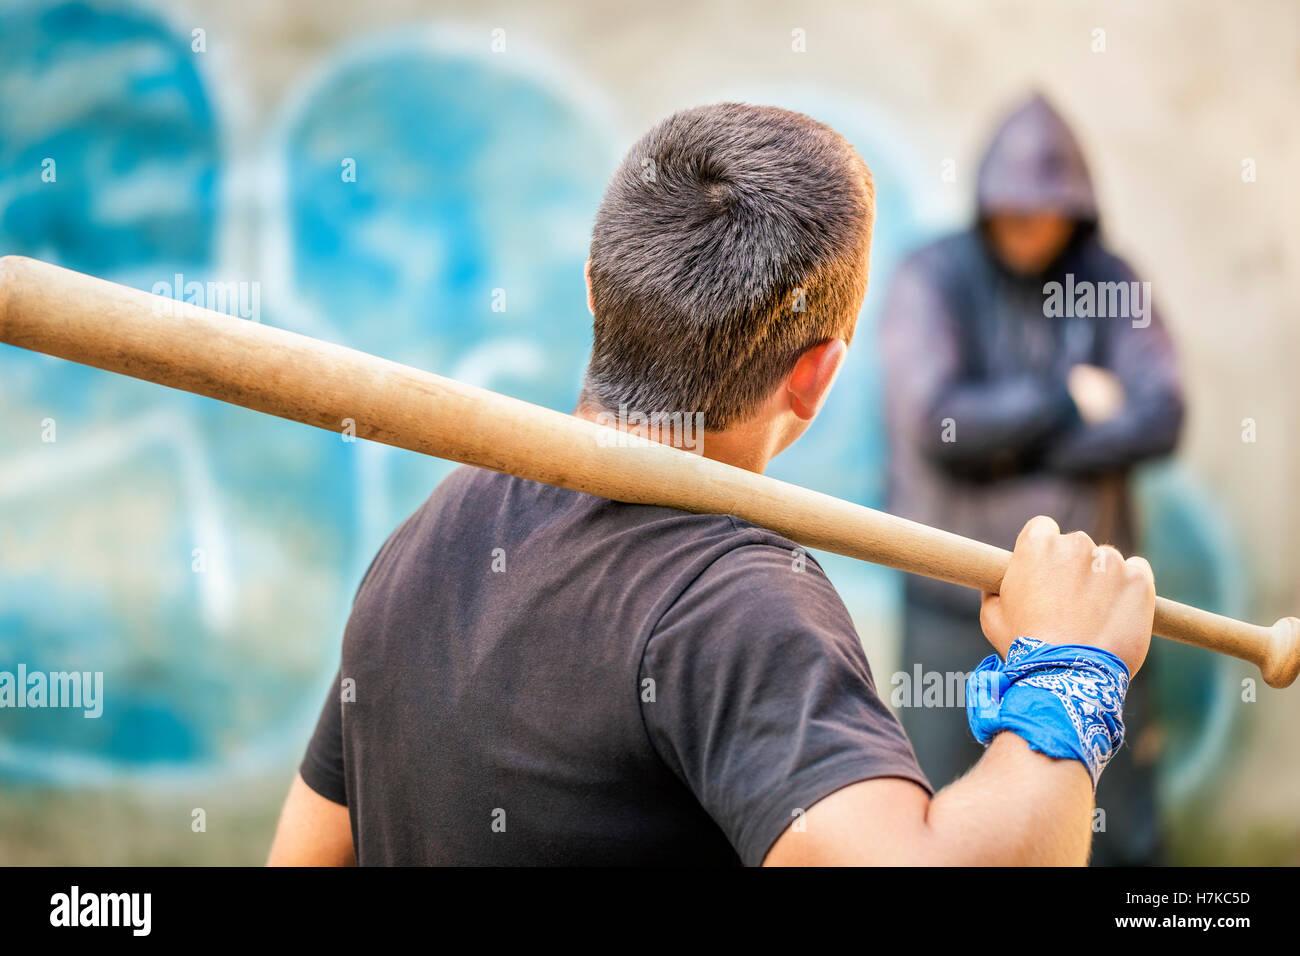 Aggressive teenager with a baseball bat against man at outdoor - Stock Image